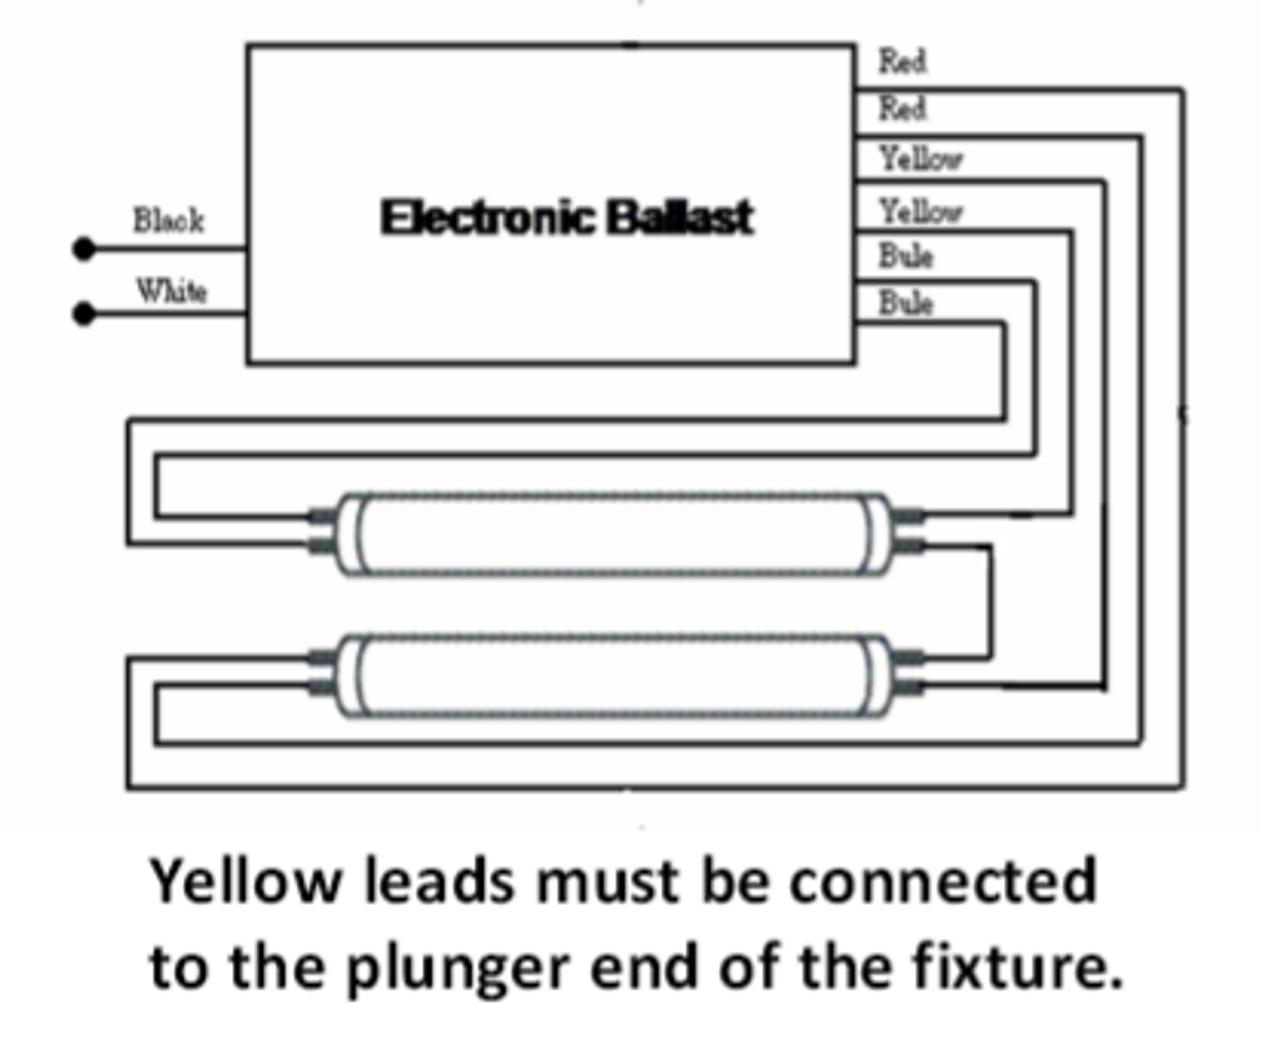 universal b295punvhe-s electronic replacement ballast  ballastshop.com